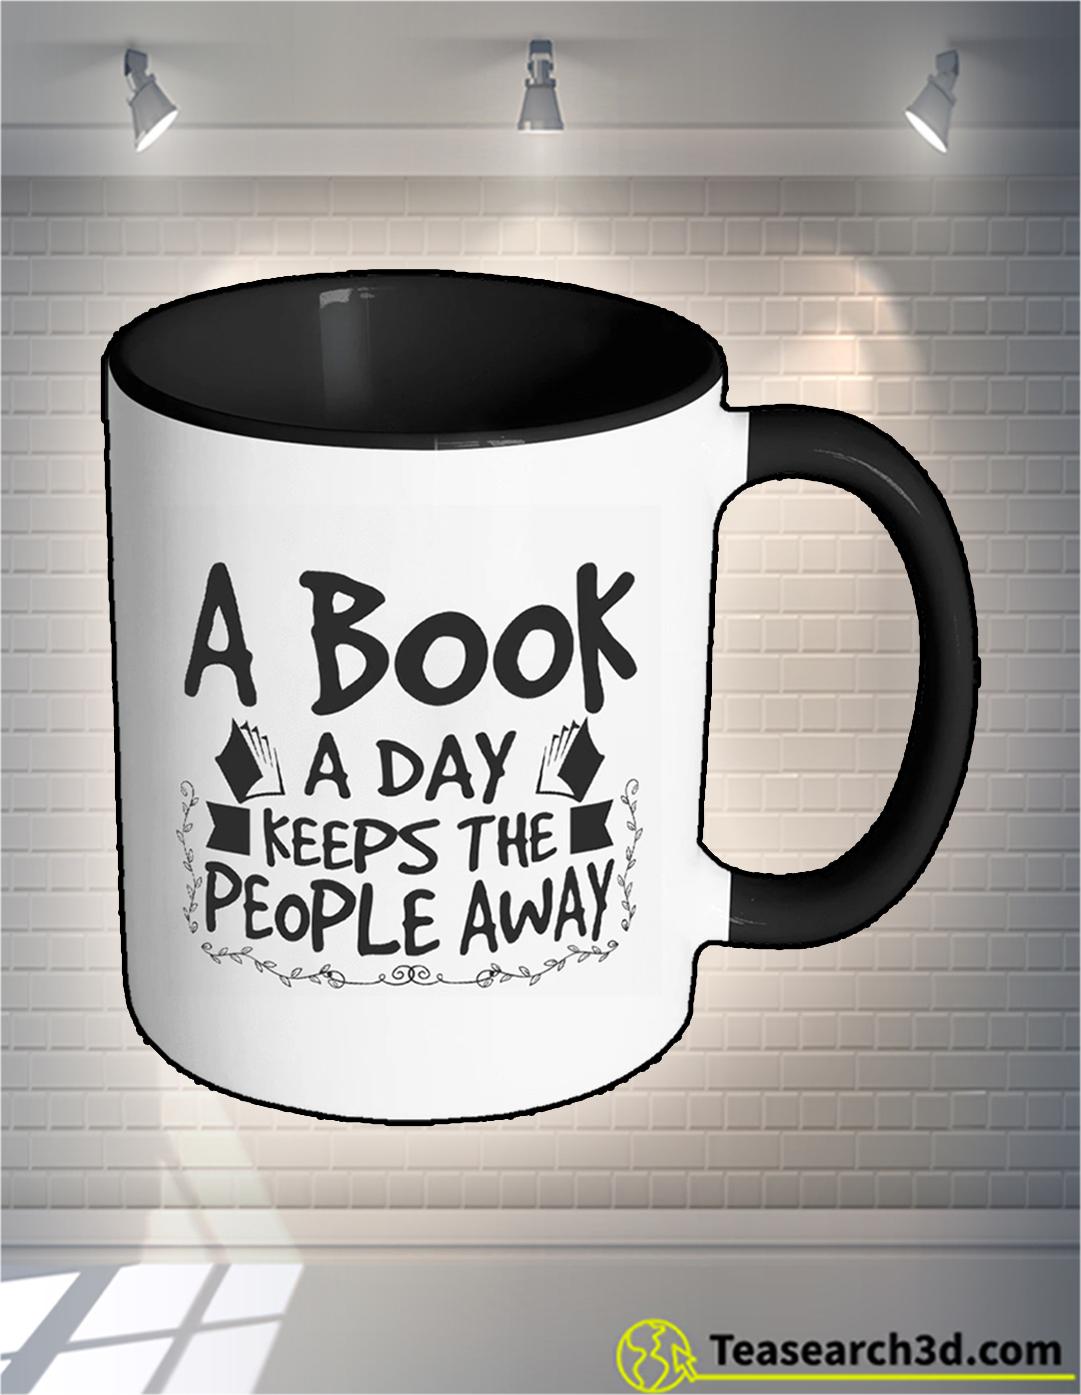 A book a day keeps the people away mug 15oz